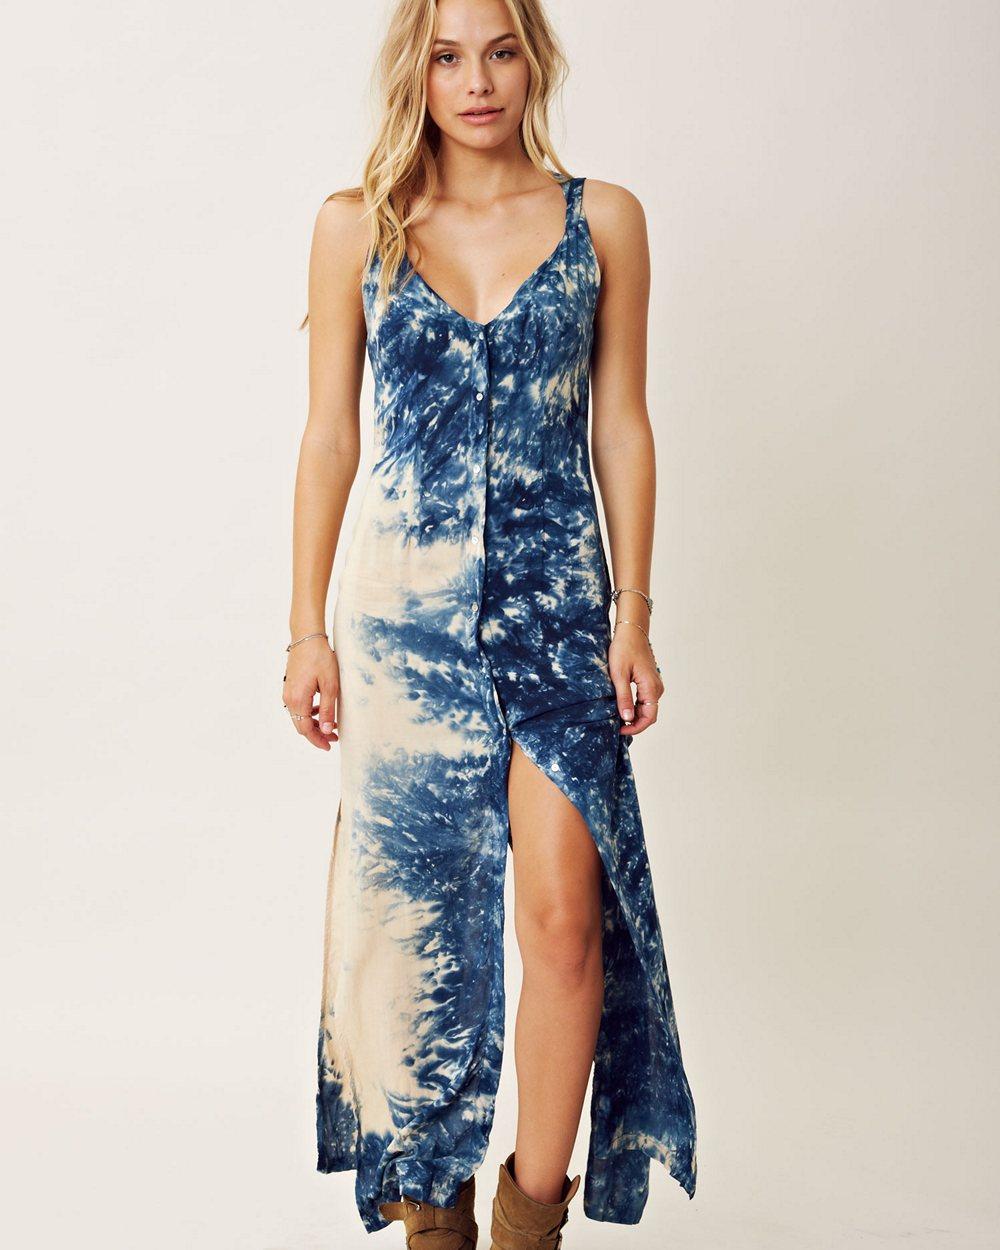 Blue Life Criss Cross Your Heart Tie Dye Dress